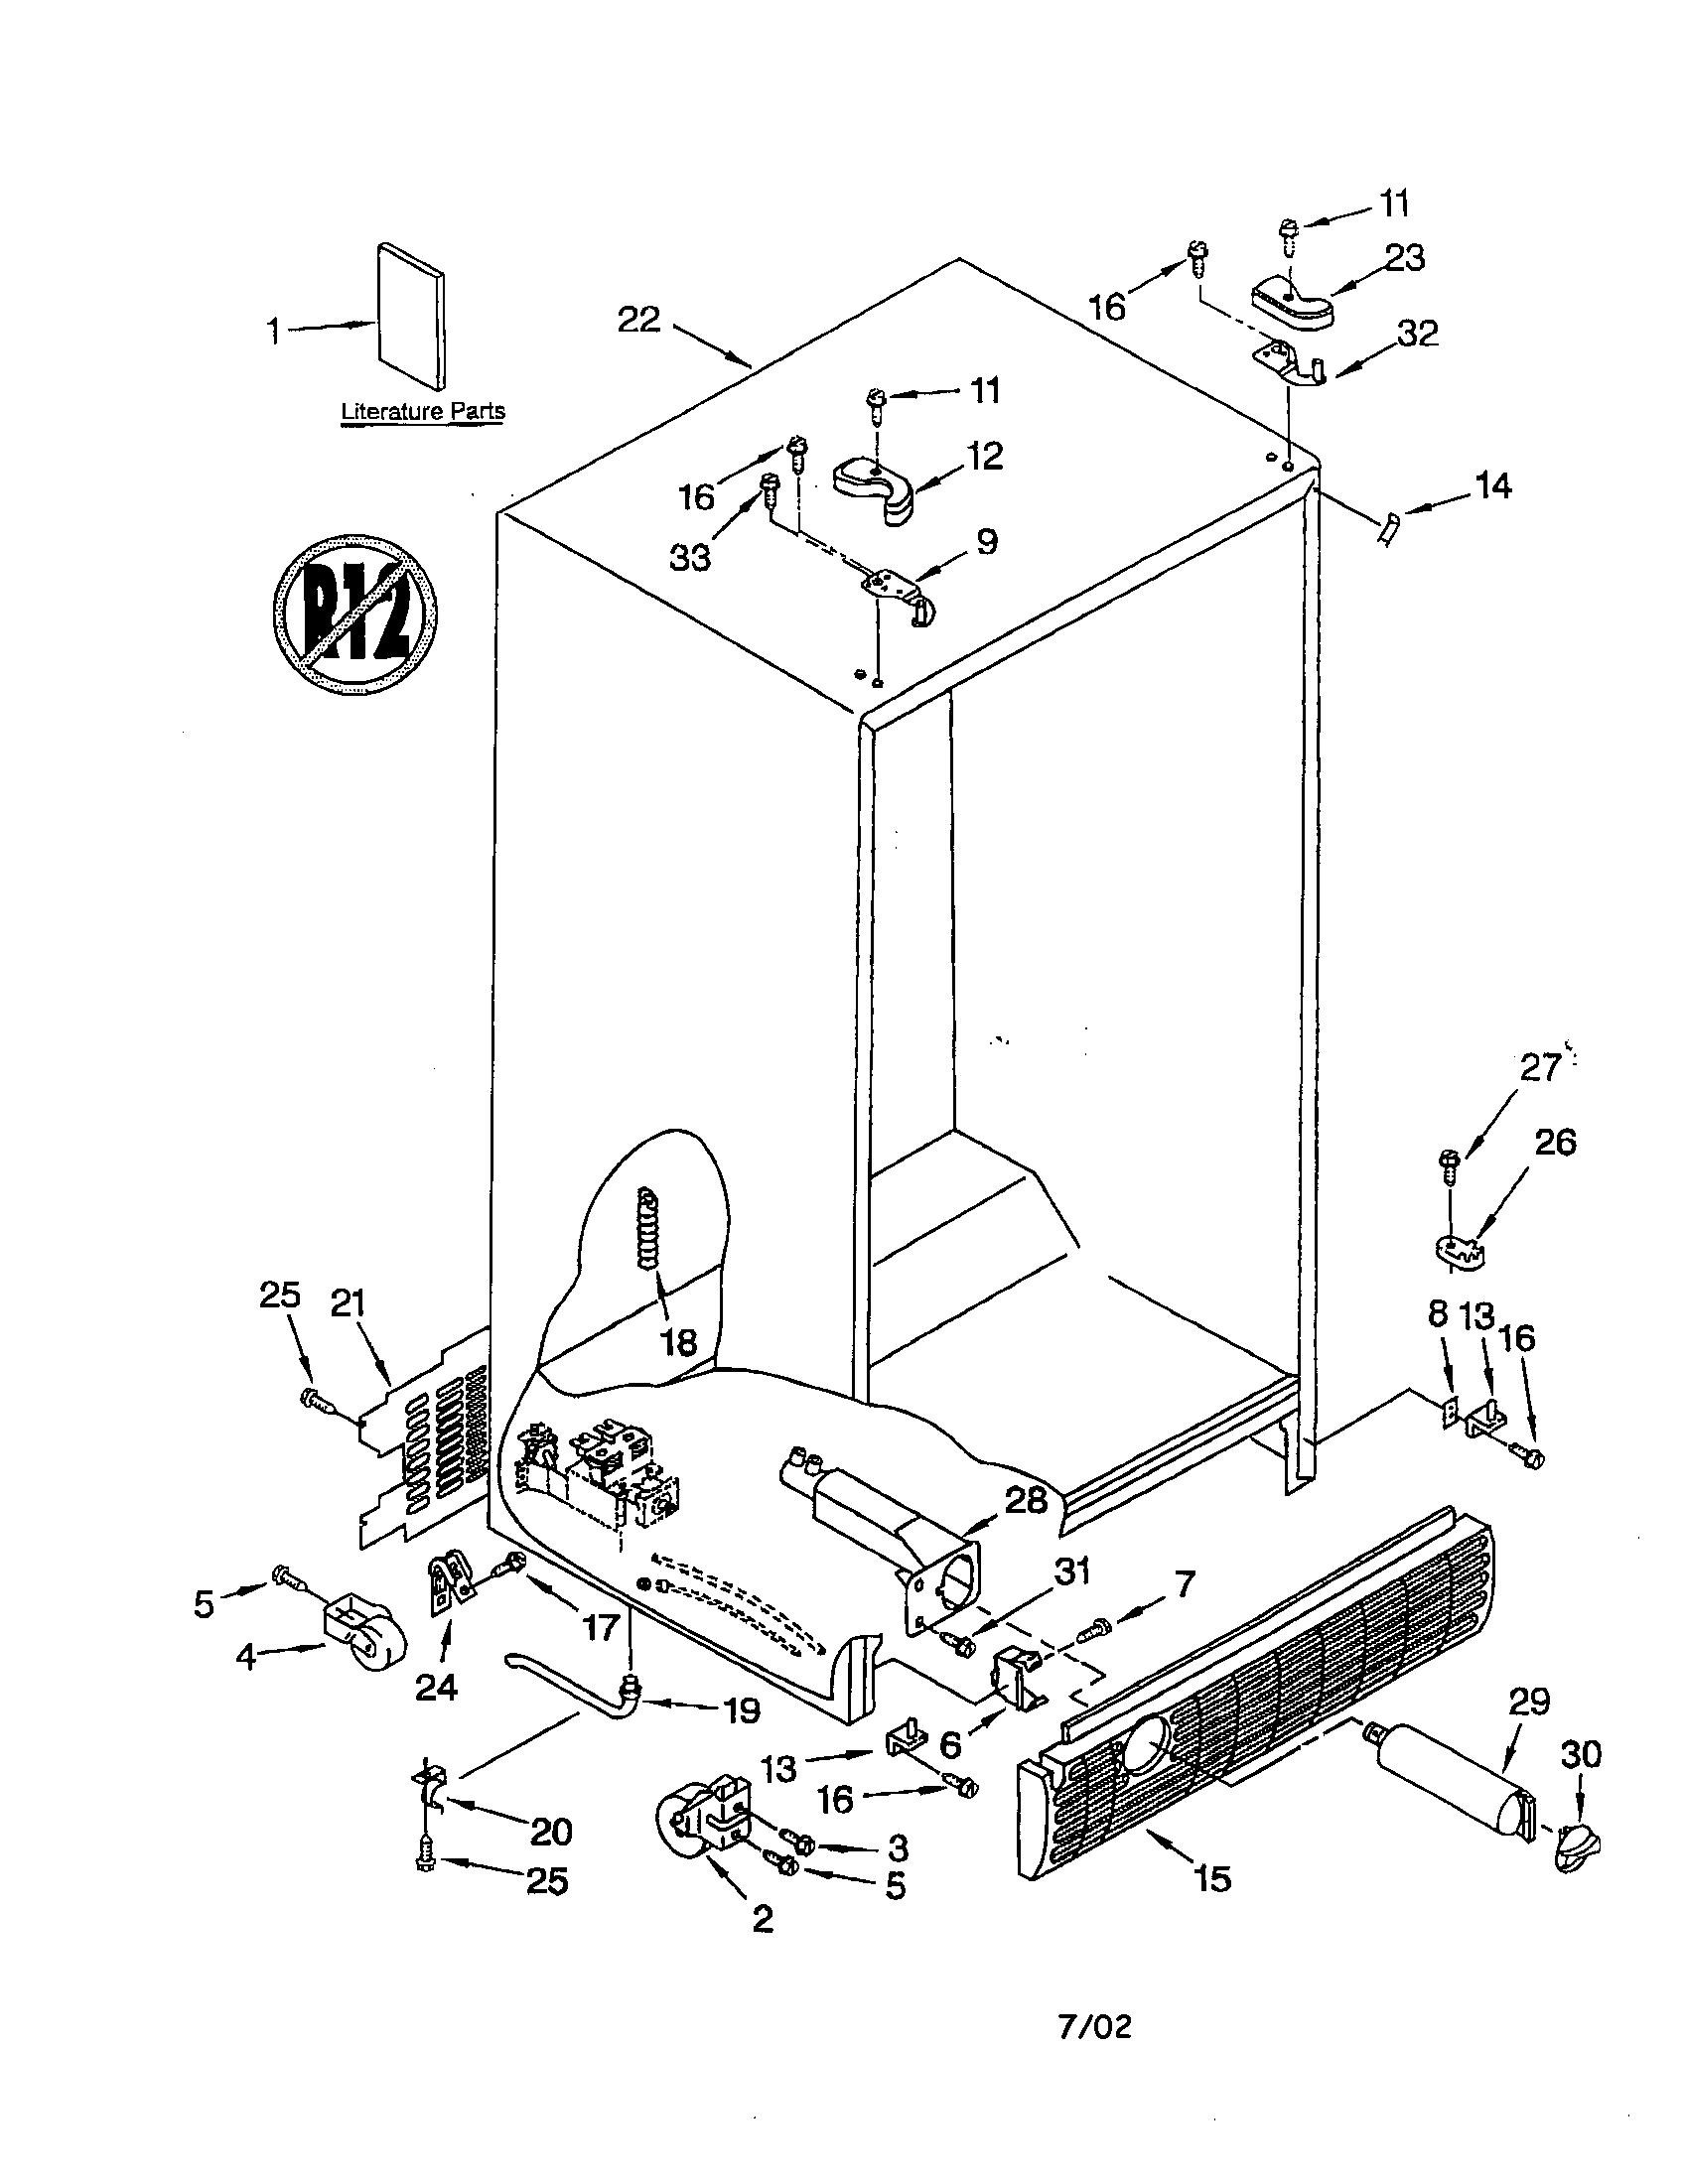 Refrigerated Refrigerator Water Line